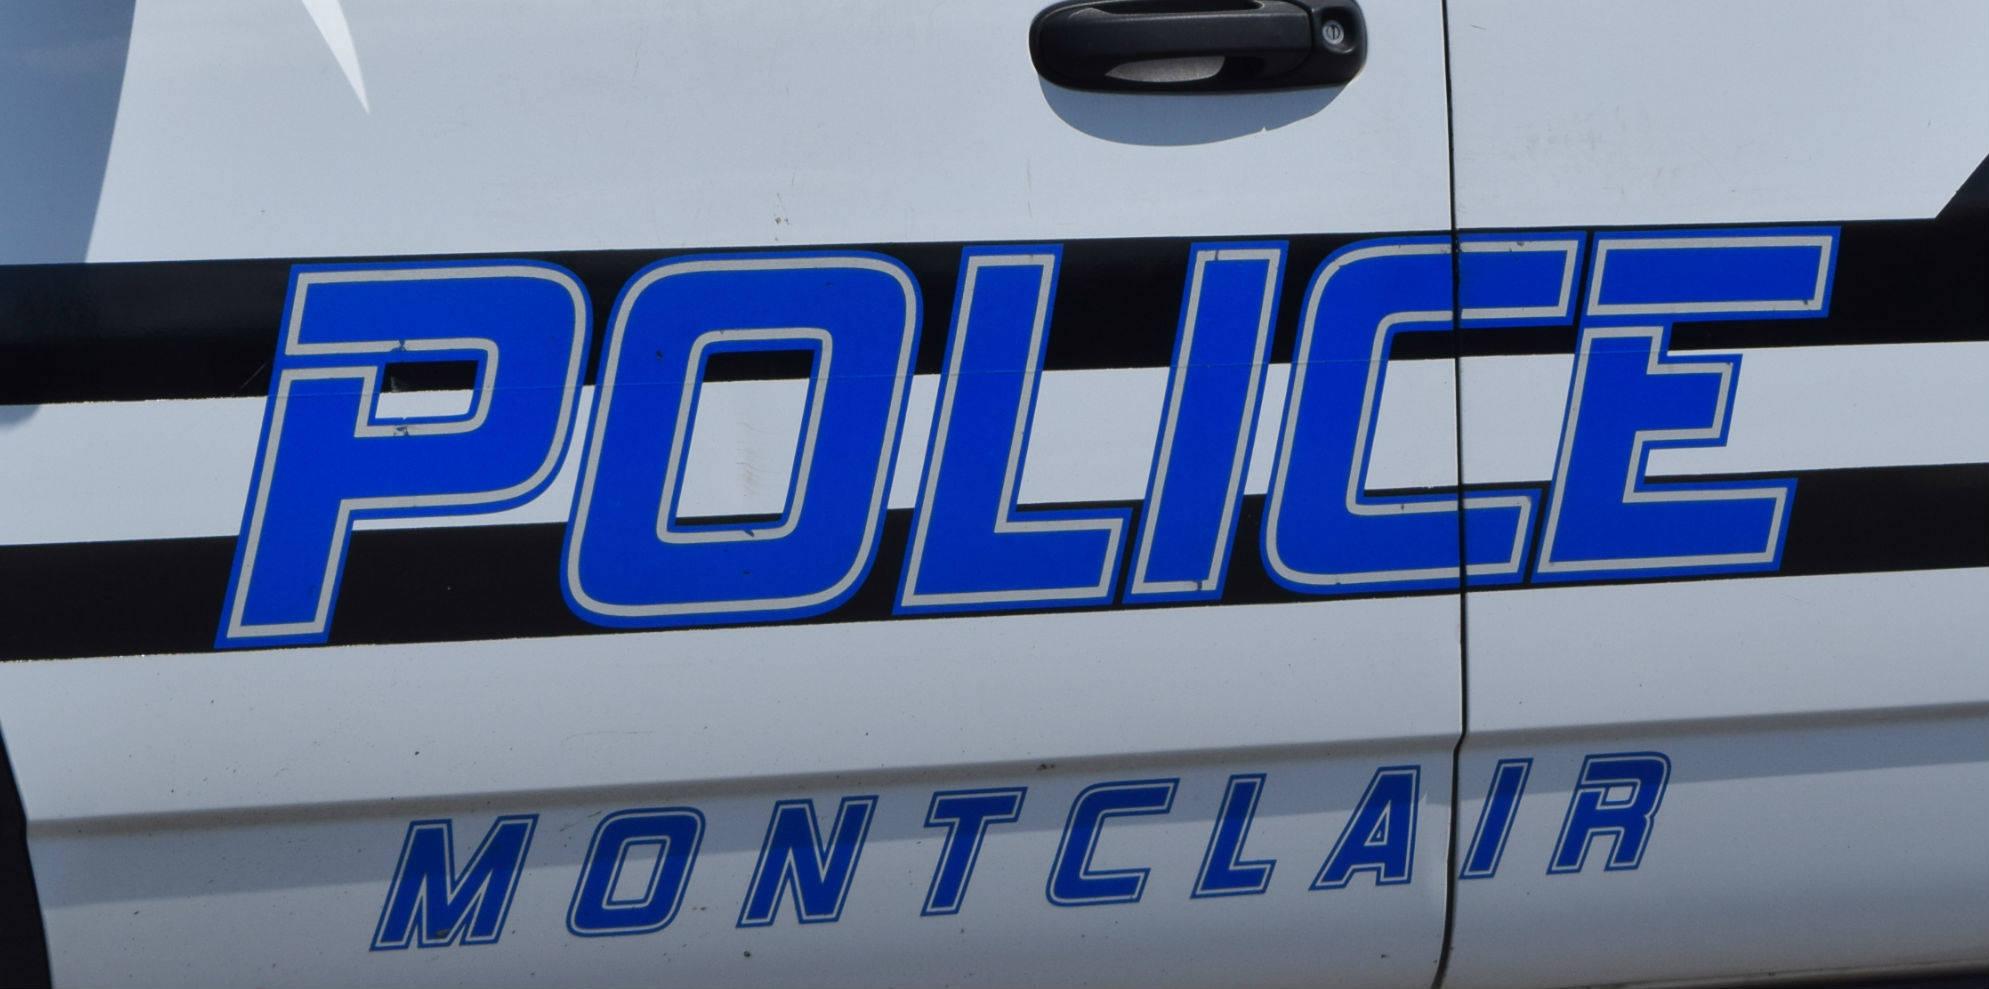 5c1455f4ac05c7960d8d_montclair.police.jpg